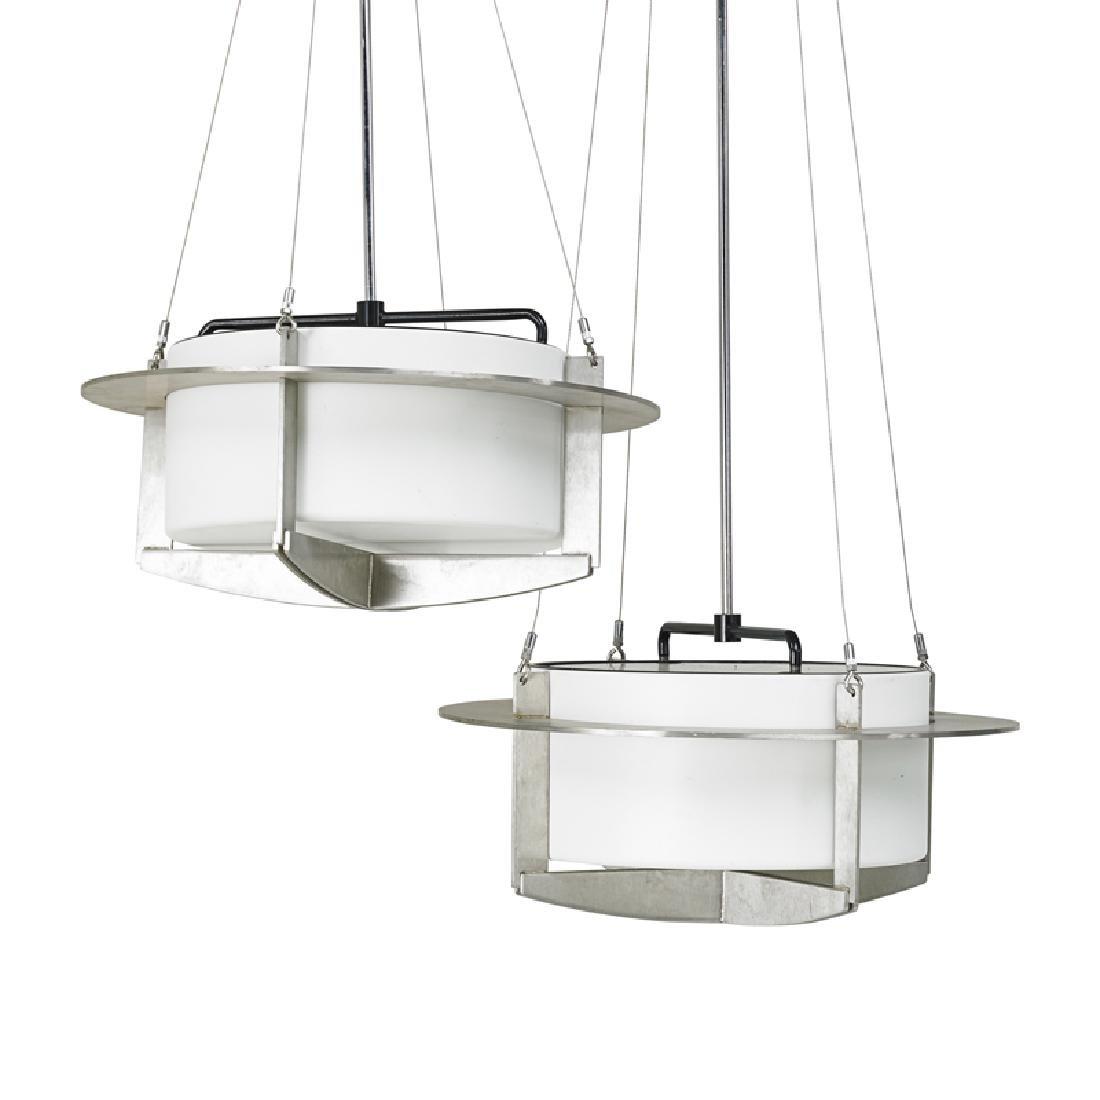 I.M. PEI Pair of chandeliers